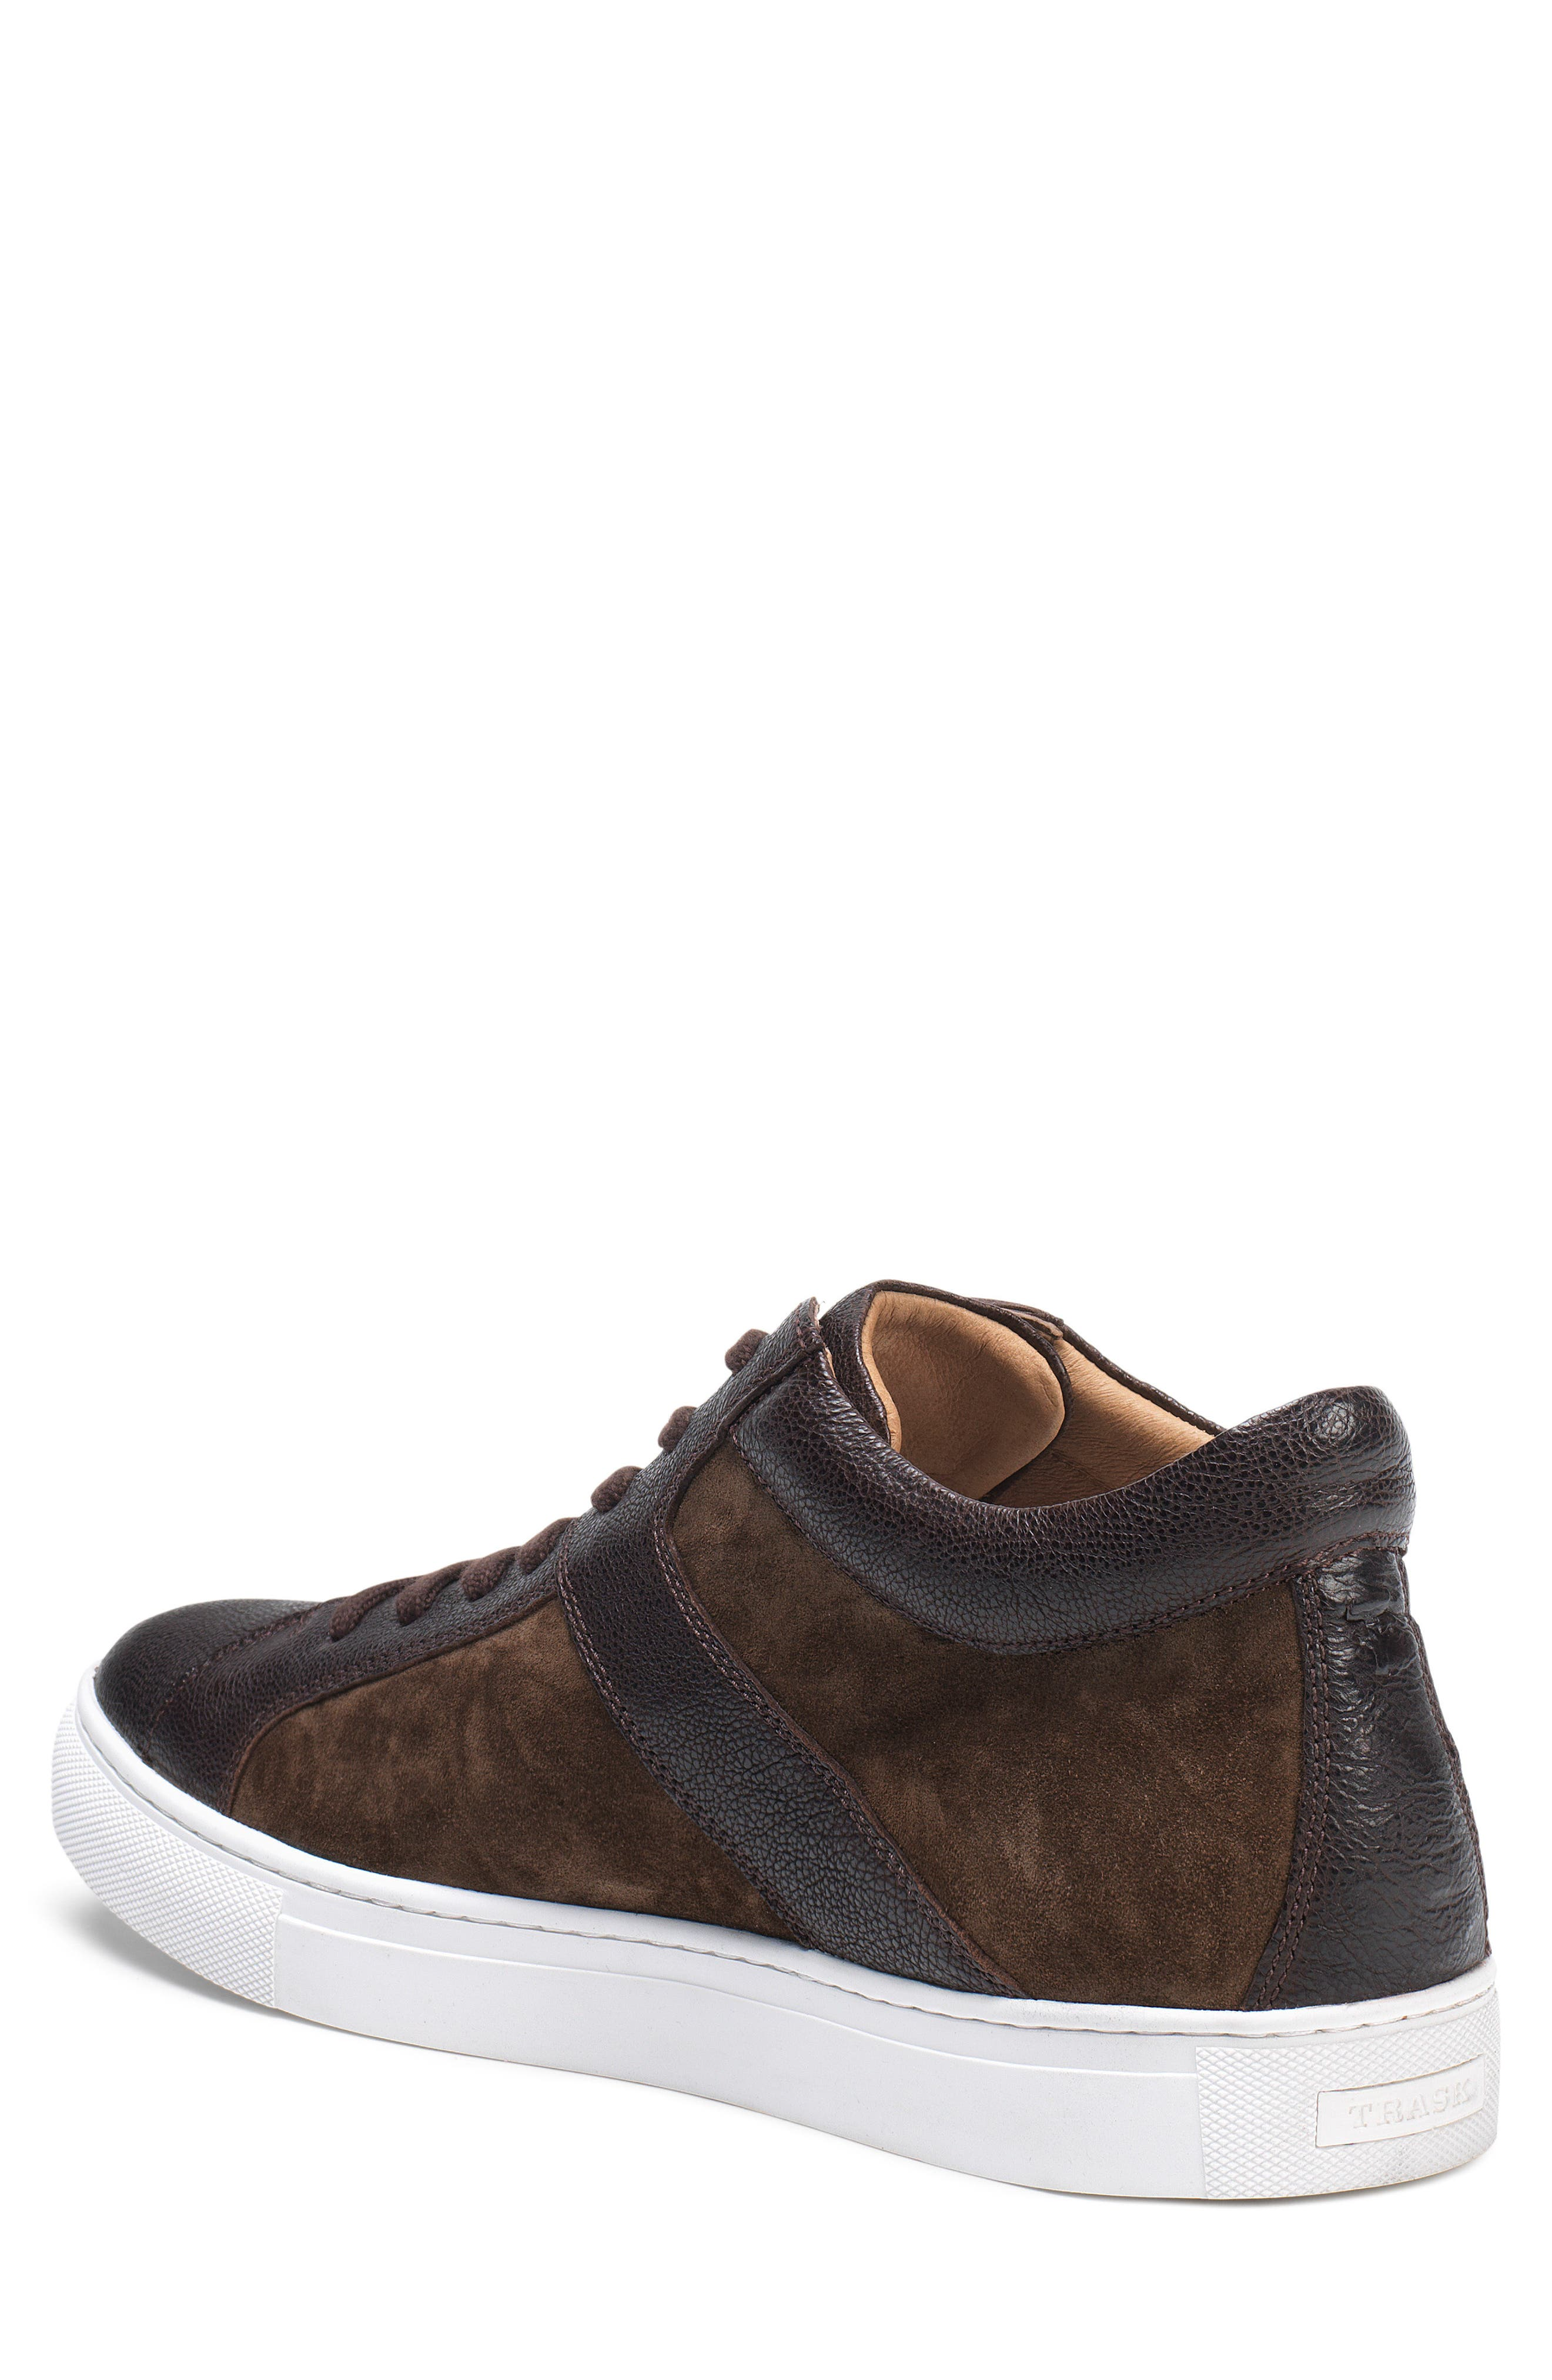 Alec Sneaker,                             Alternate thumbnail 2, color,                             Dark Brown Leather/Suede